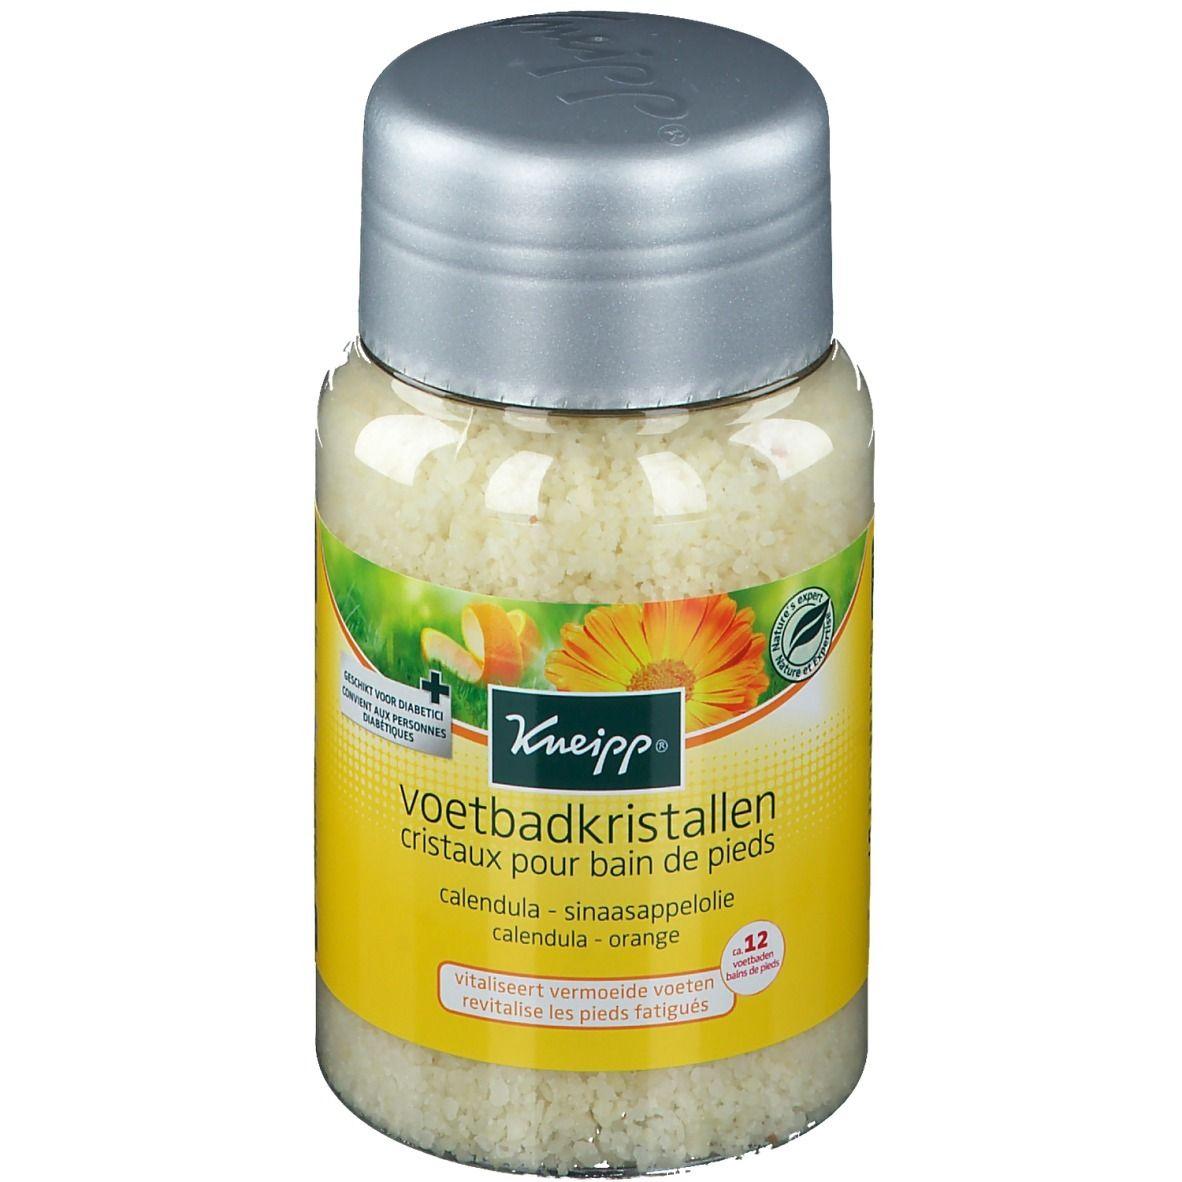 Kneipp® Cristaux pour bain de pieds Calendula - Orange g sel de bain